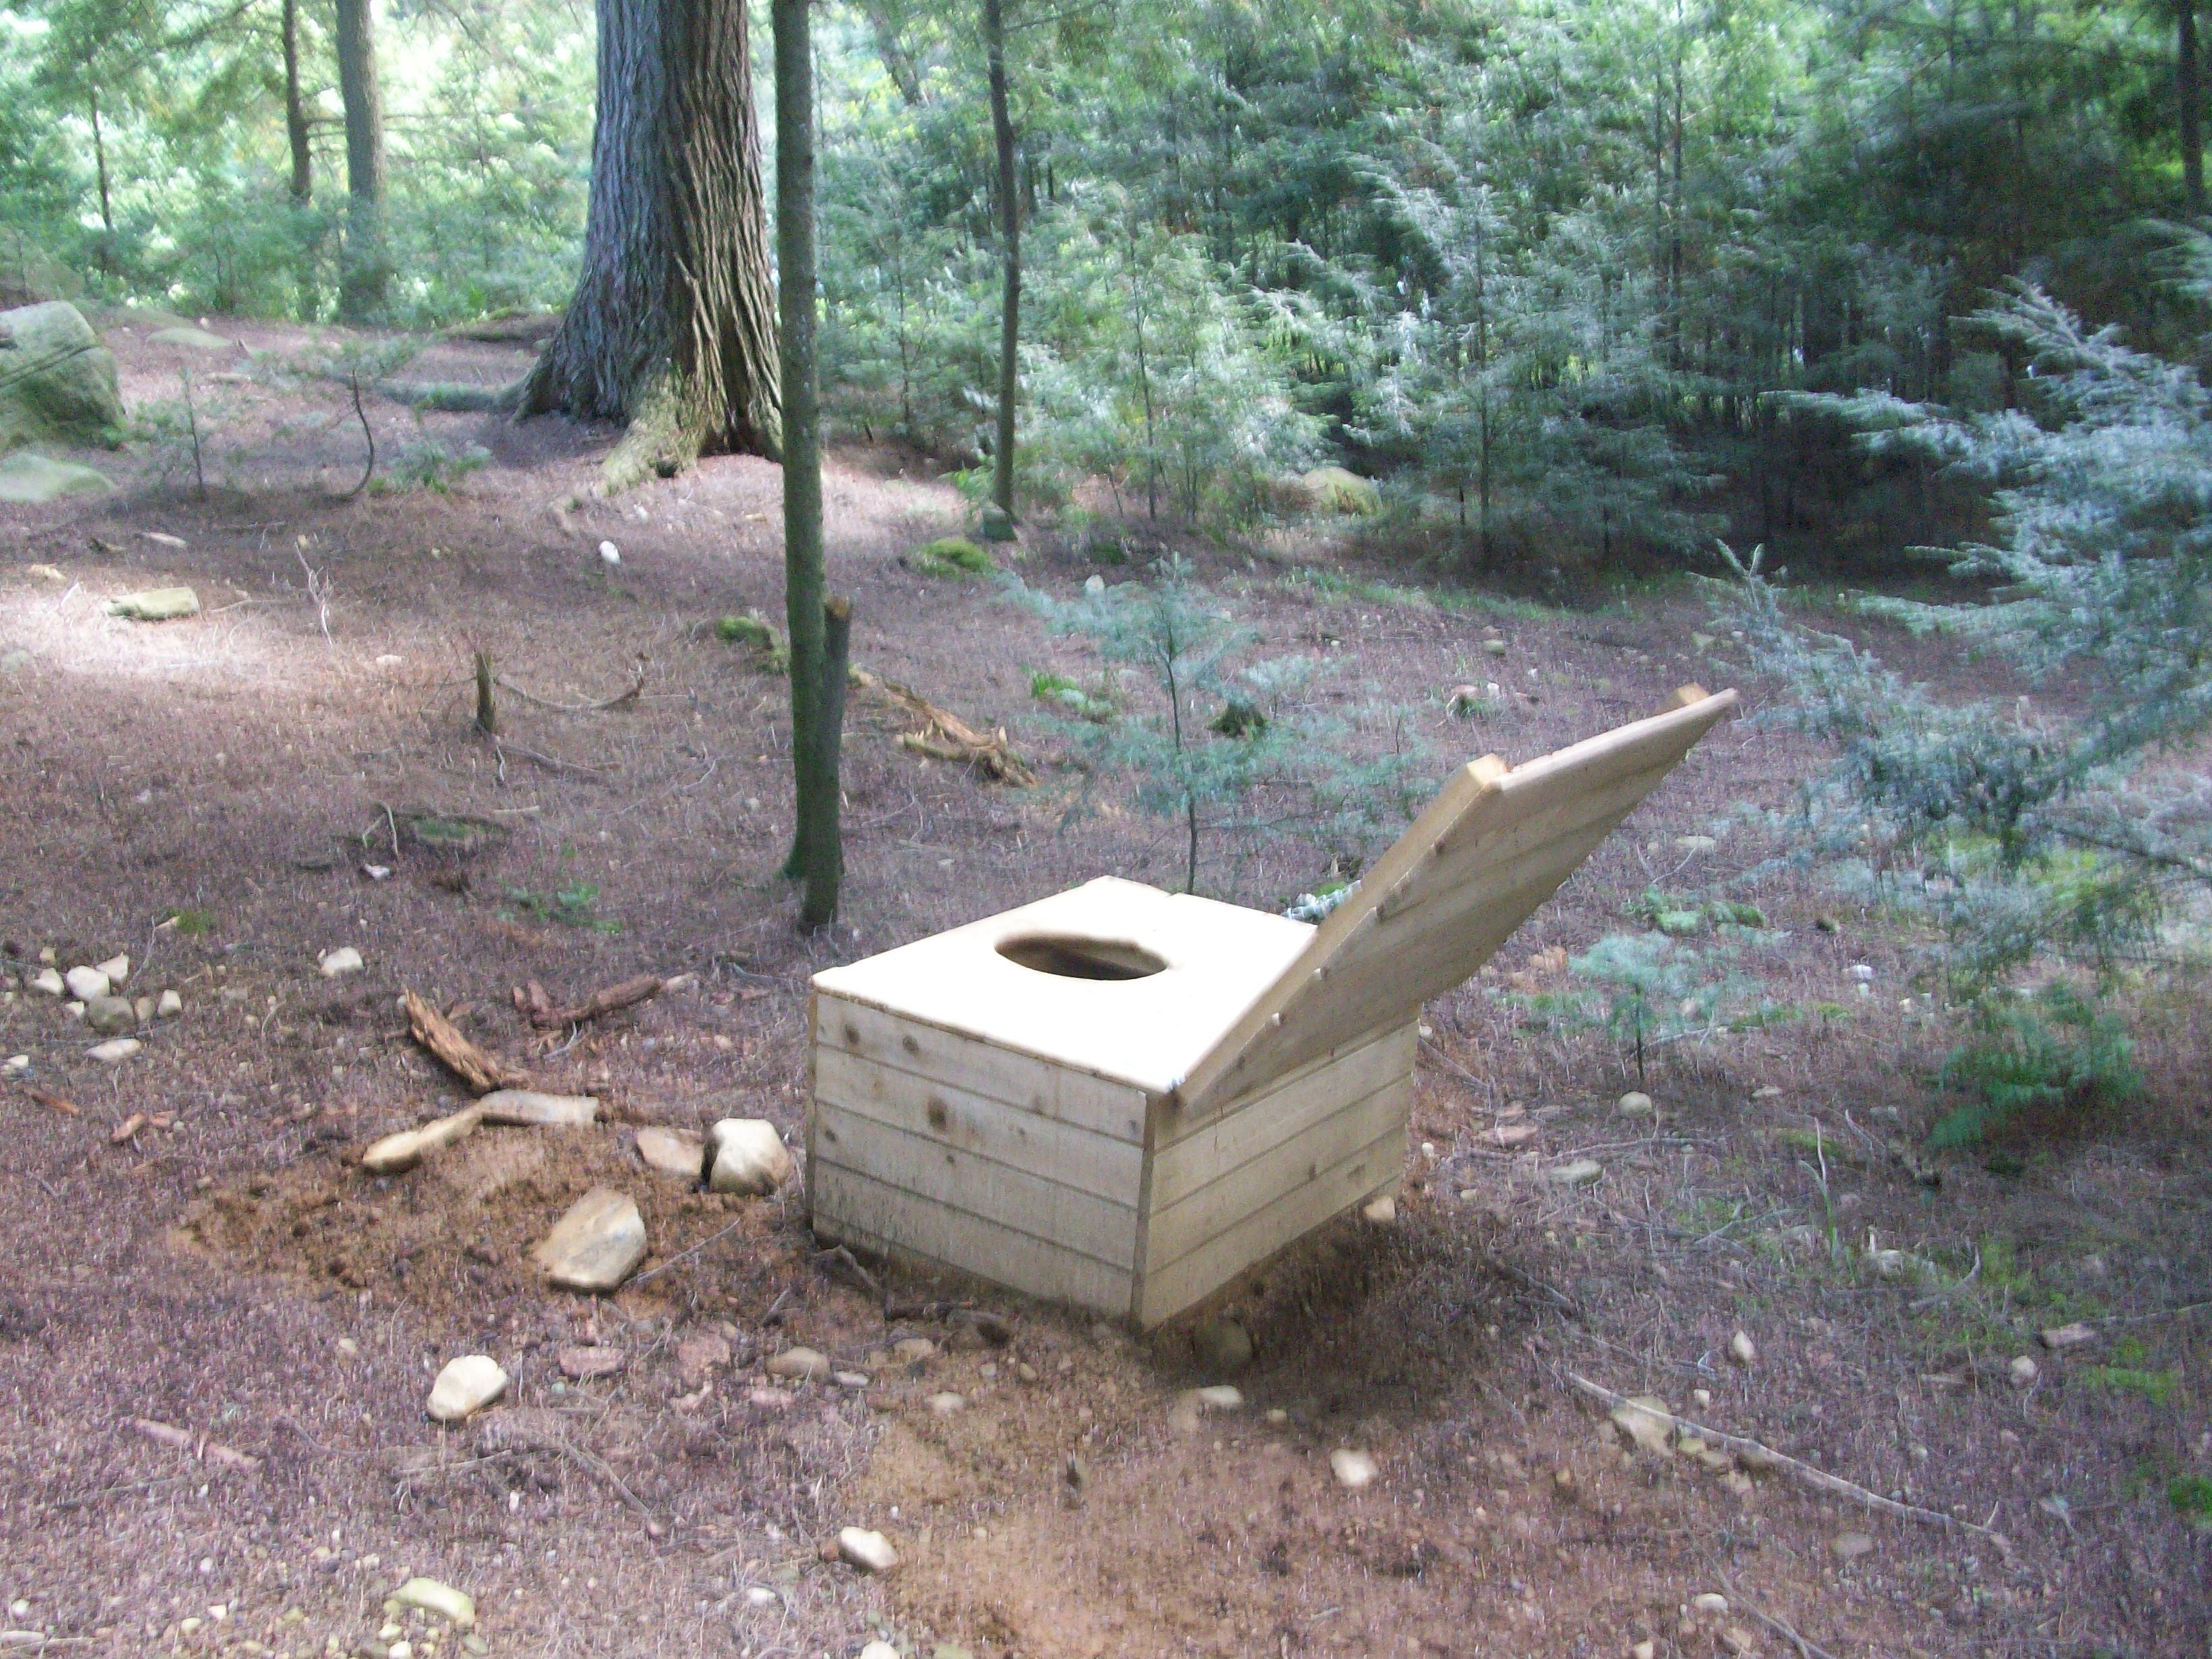 outdoor commode in woods